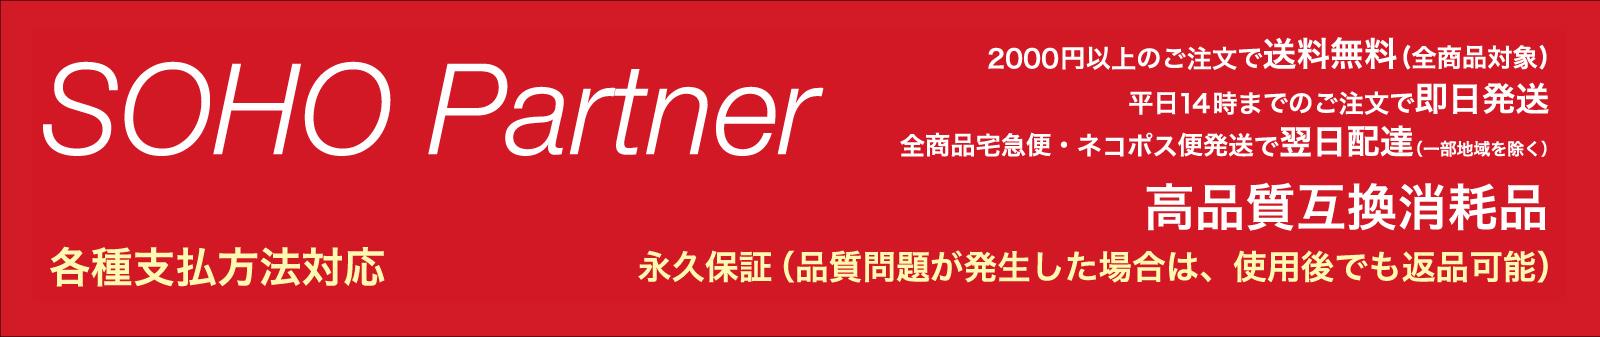 SOHO Partner ヤフー店の店舗看板